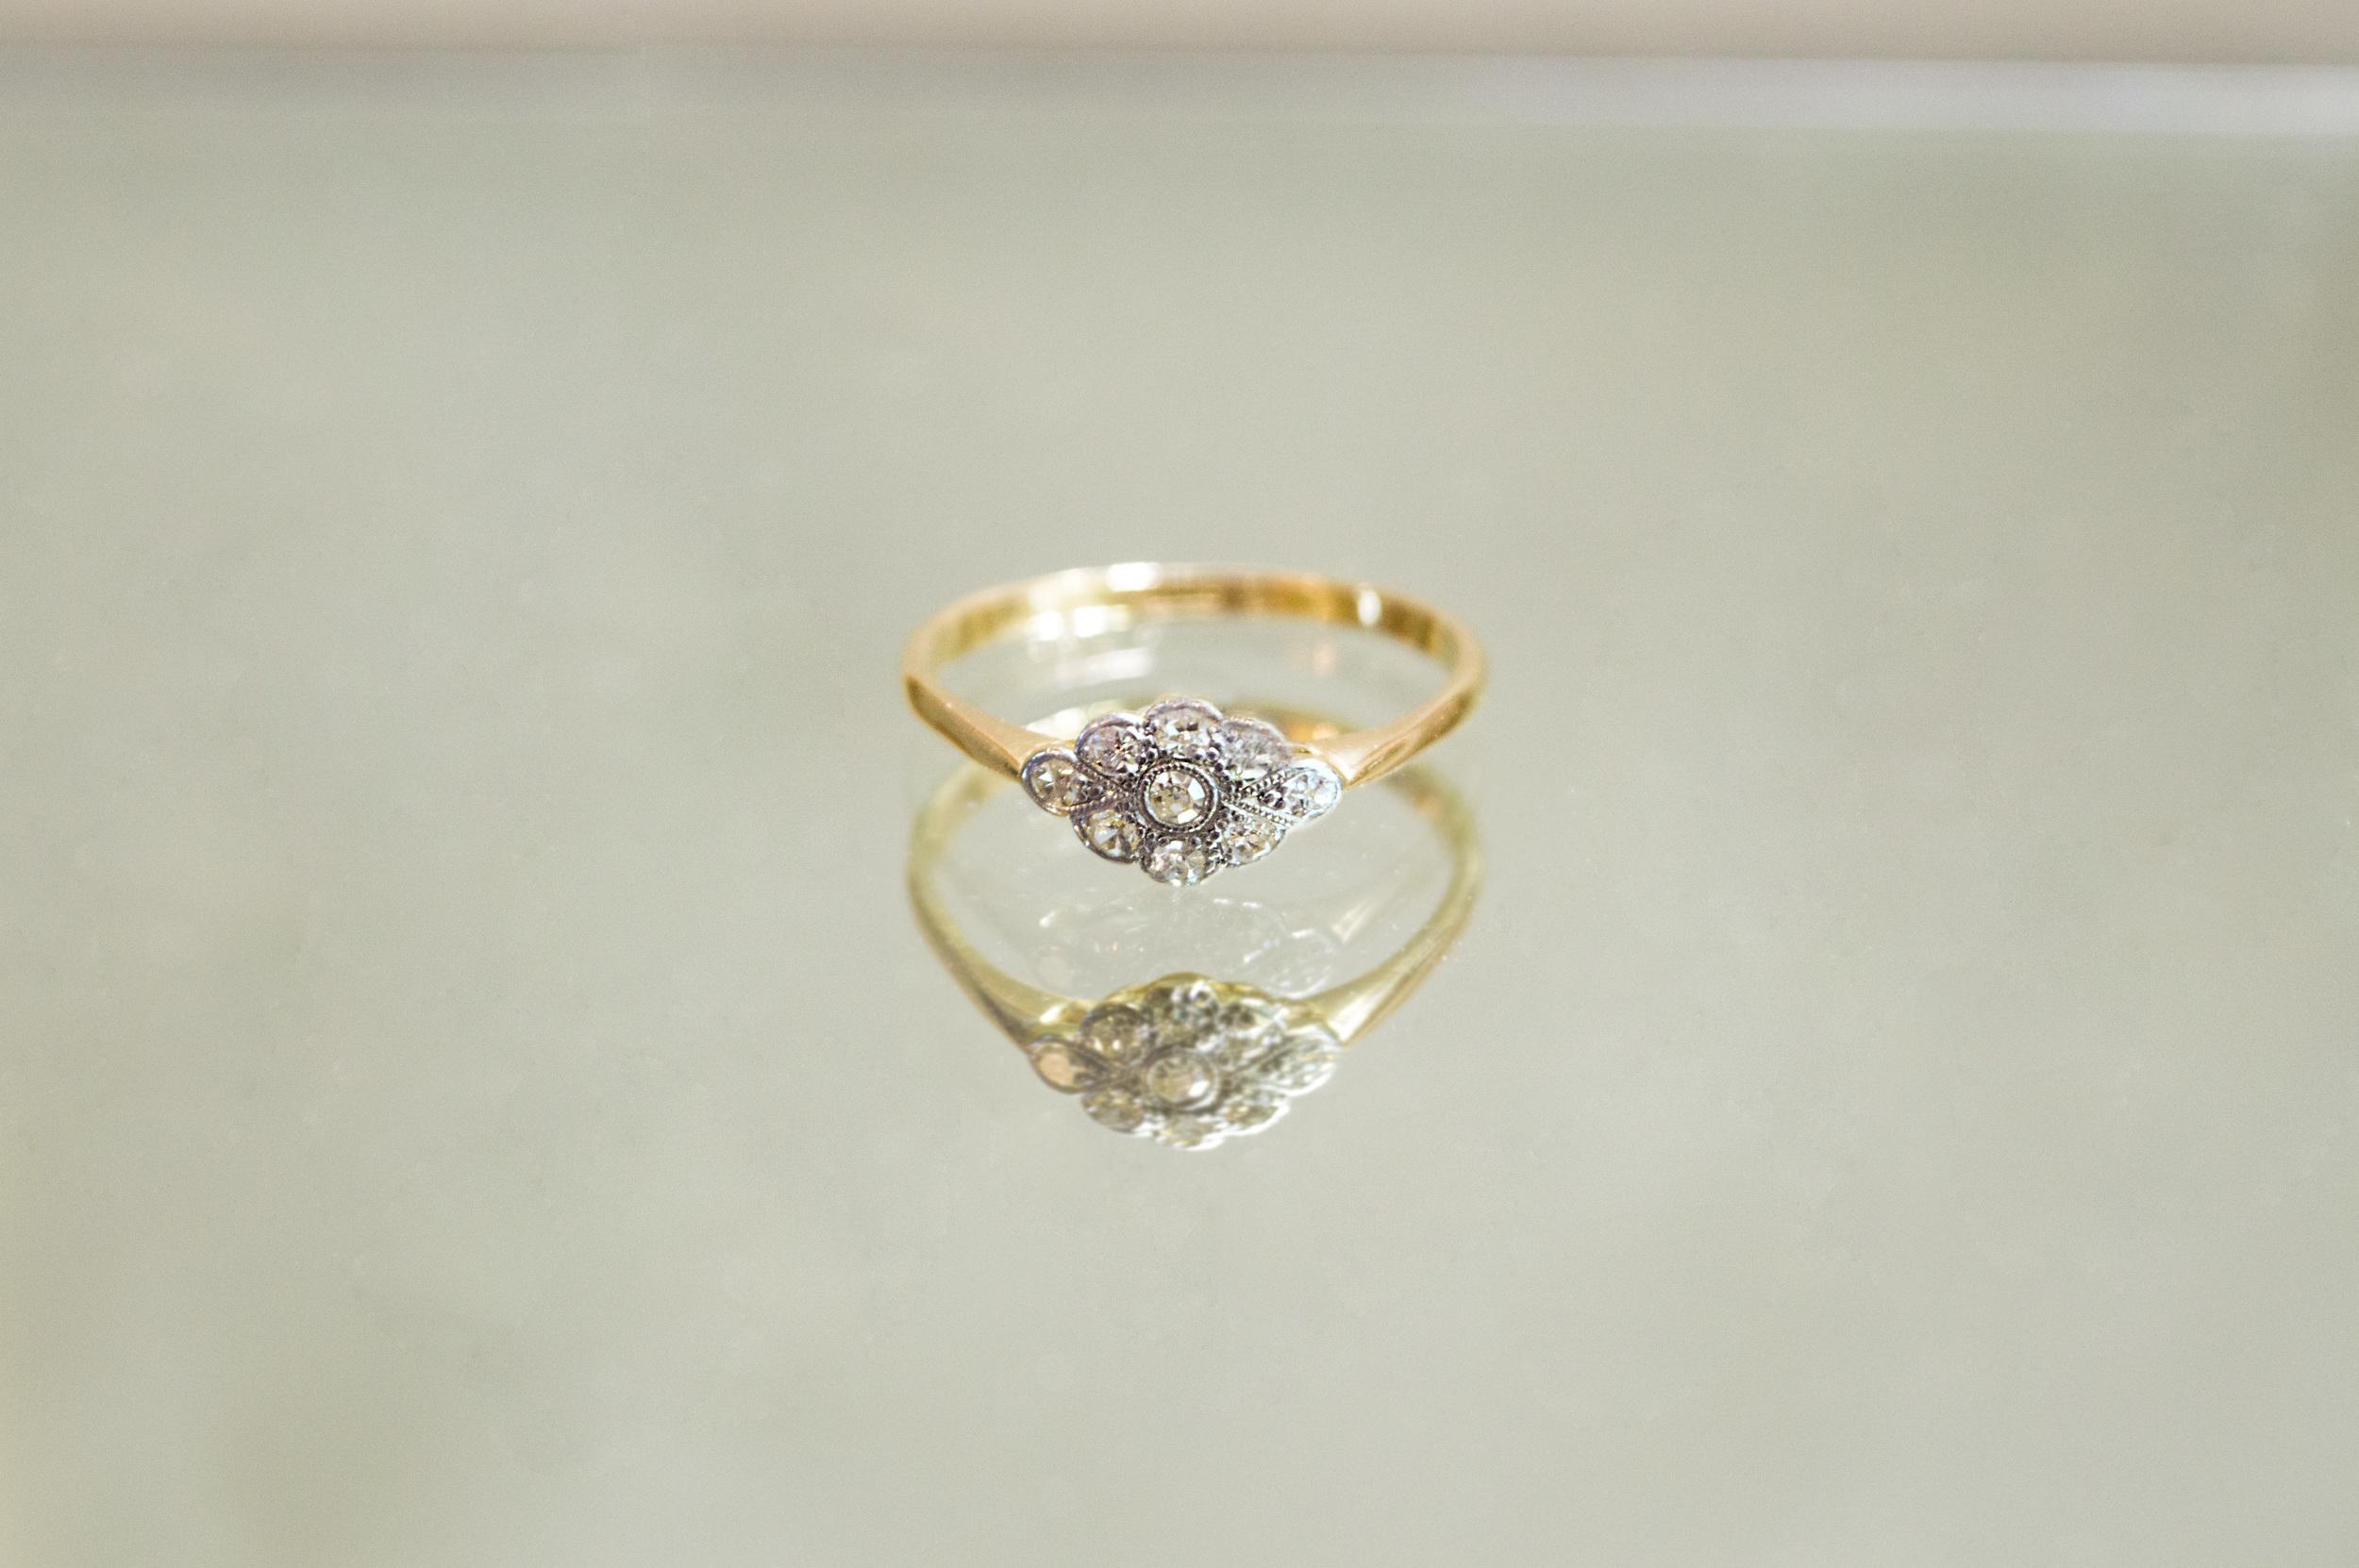 £235 - 18ct Diamond Ring